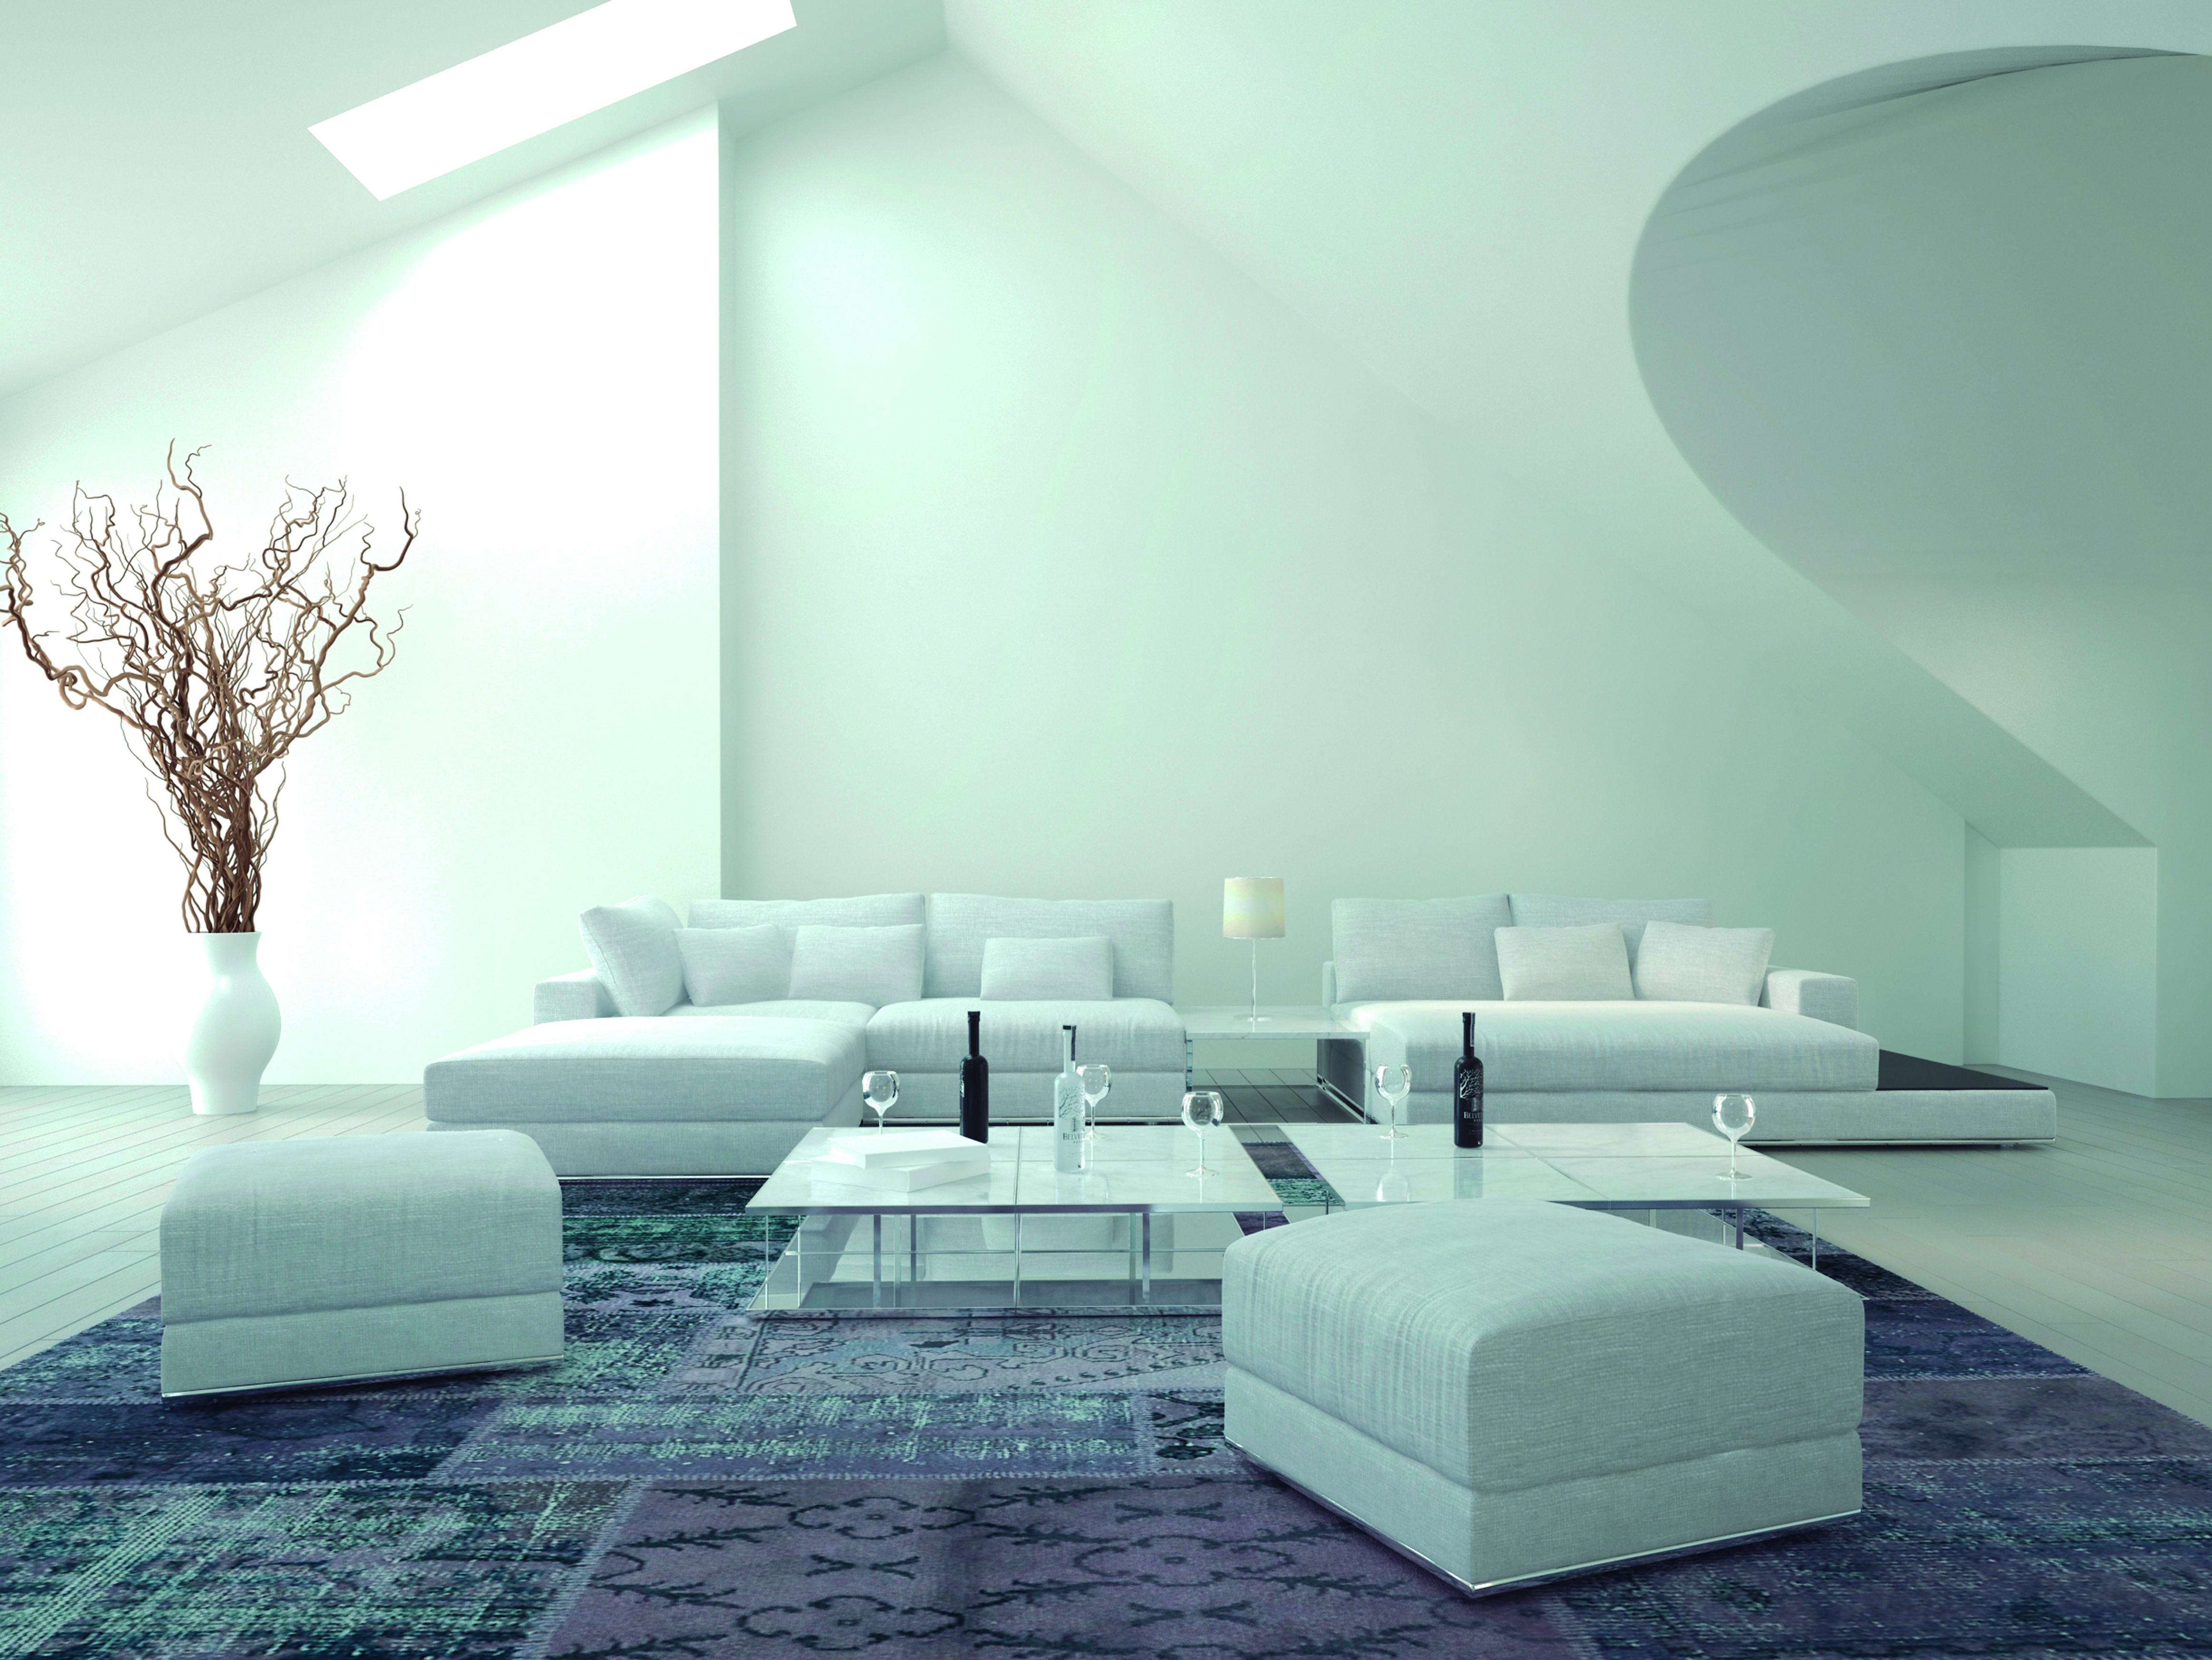 Pintura Acrílica Interiores